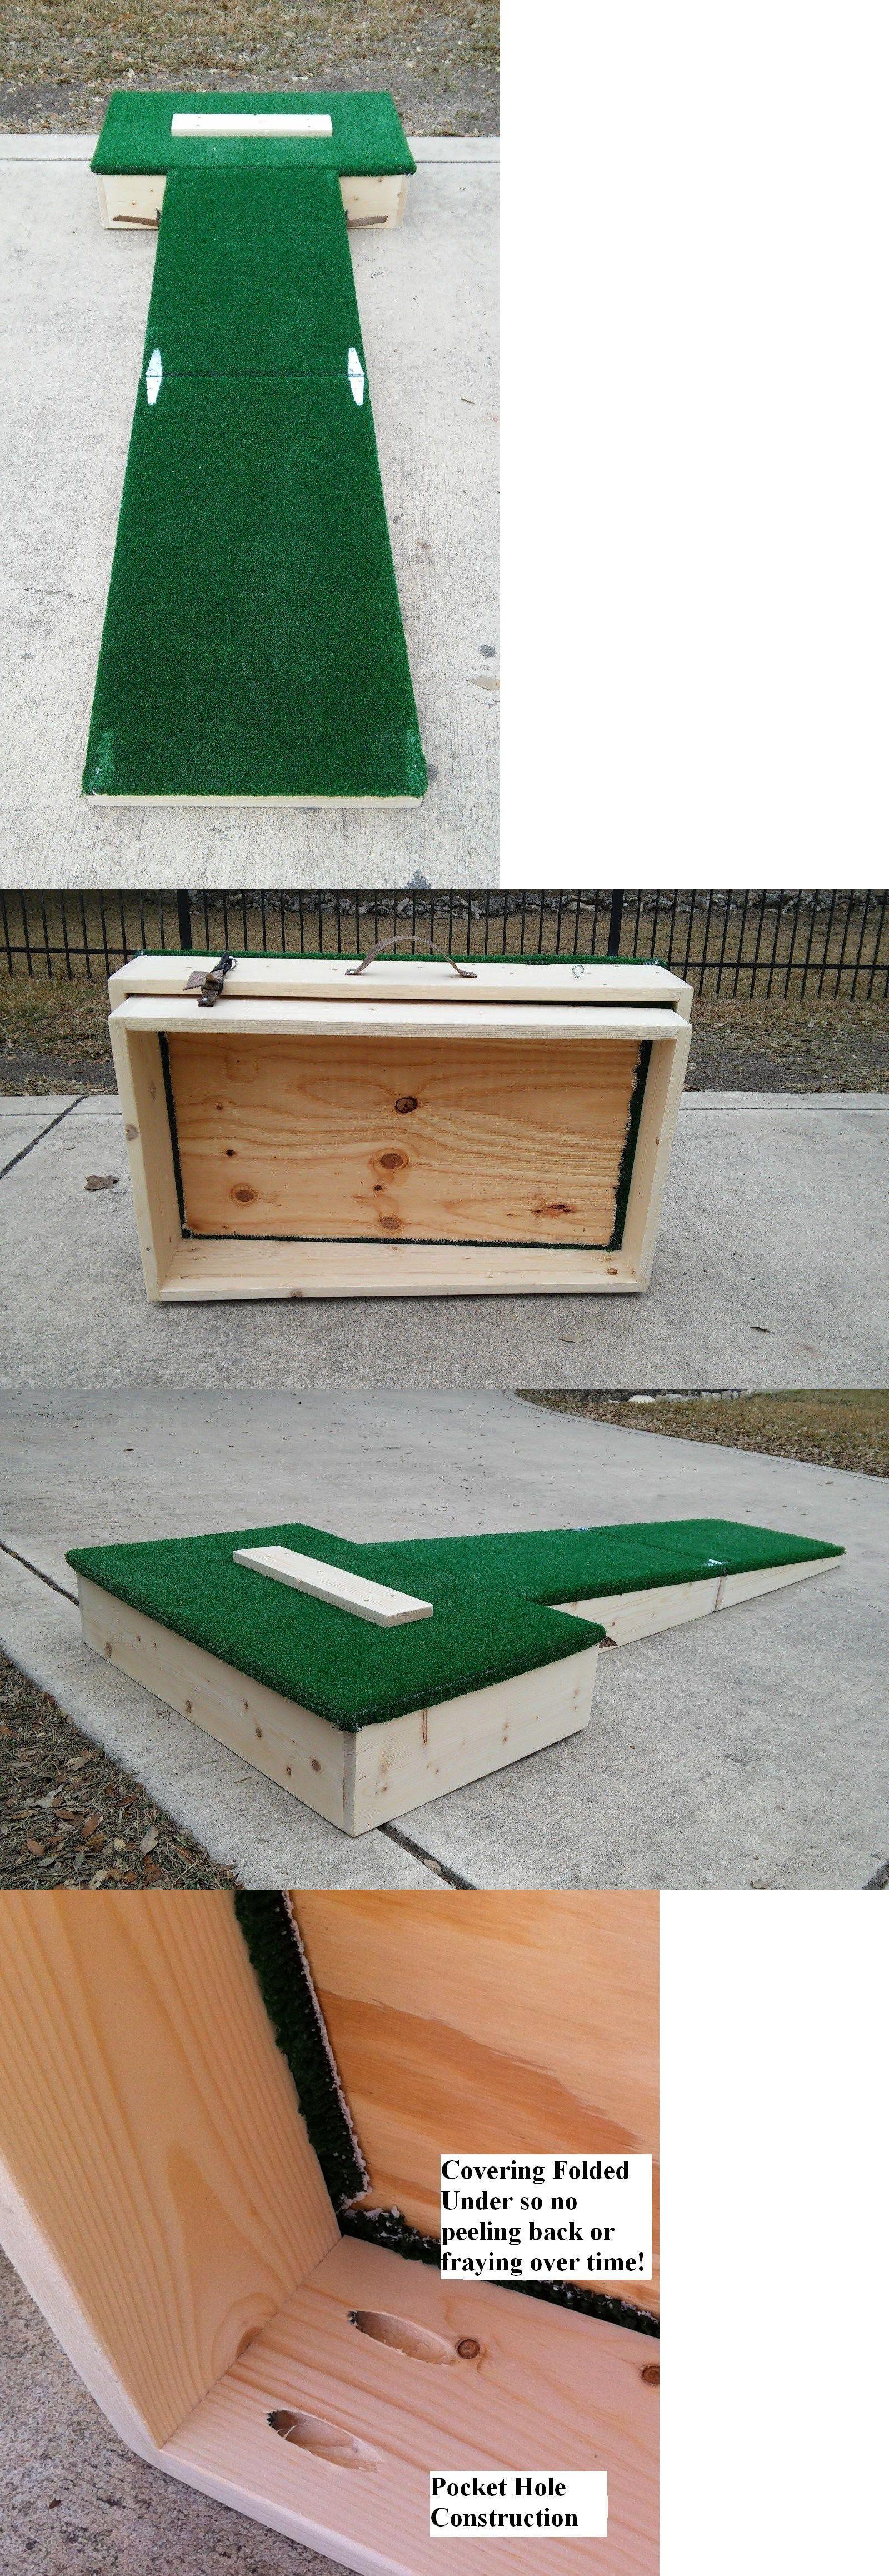 other baseball training aids 181332 portable pitching mound 6